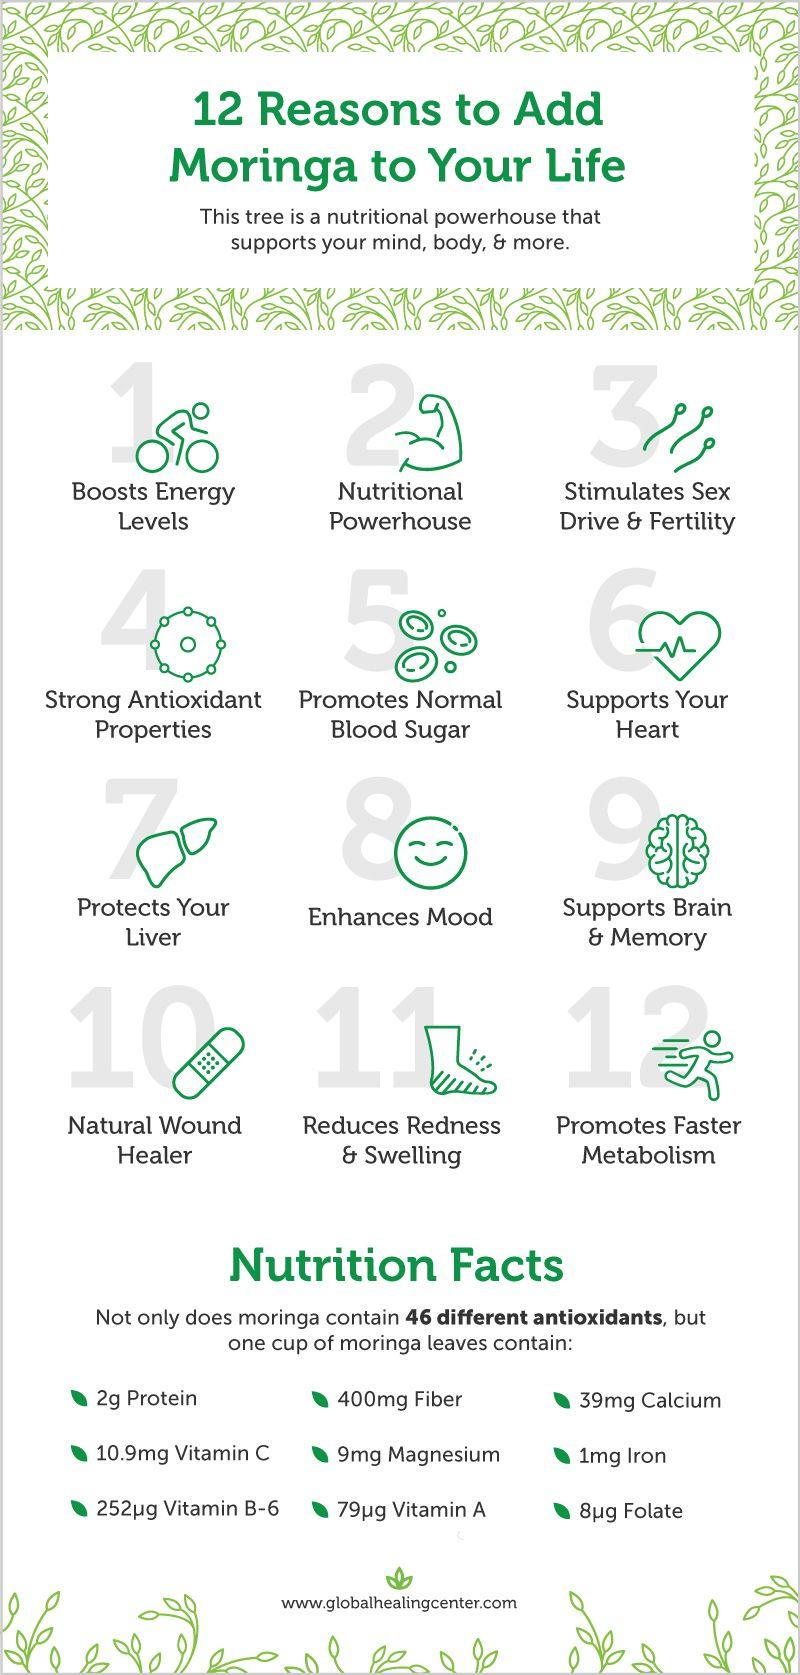 Benefits of Moringa A Nutritional Powerhouse Moringa